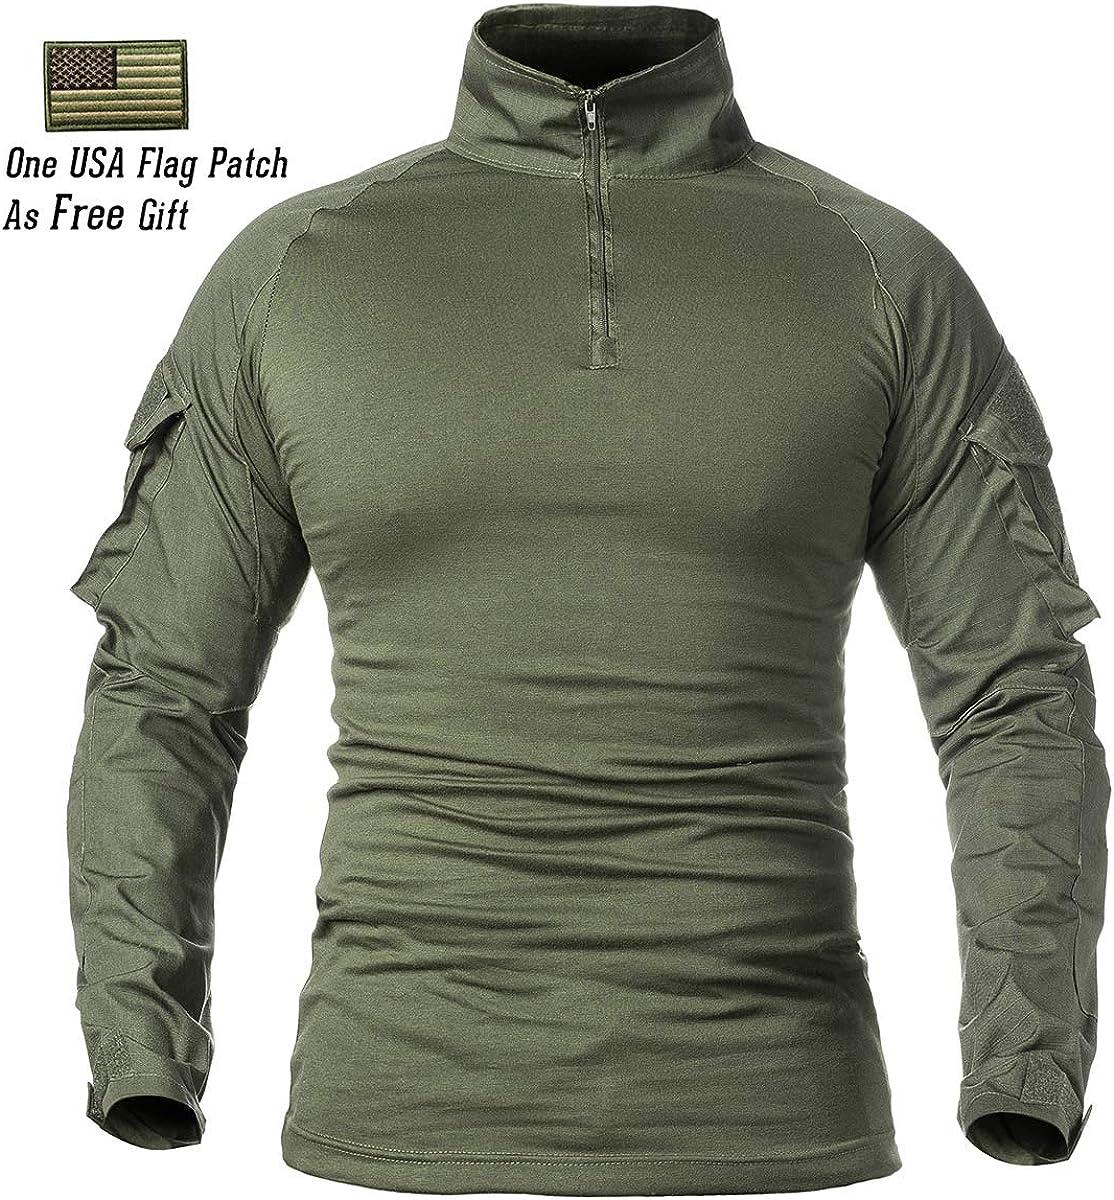 ReFire Gear Mens Military Tactical Army Combat Long//Short Sleeve Shirt Slim Fit Camo T-Shirt with 1//4 Zipper